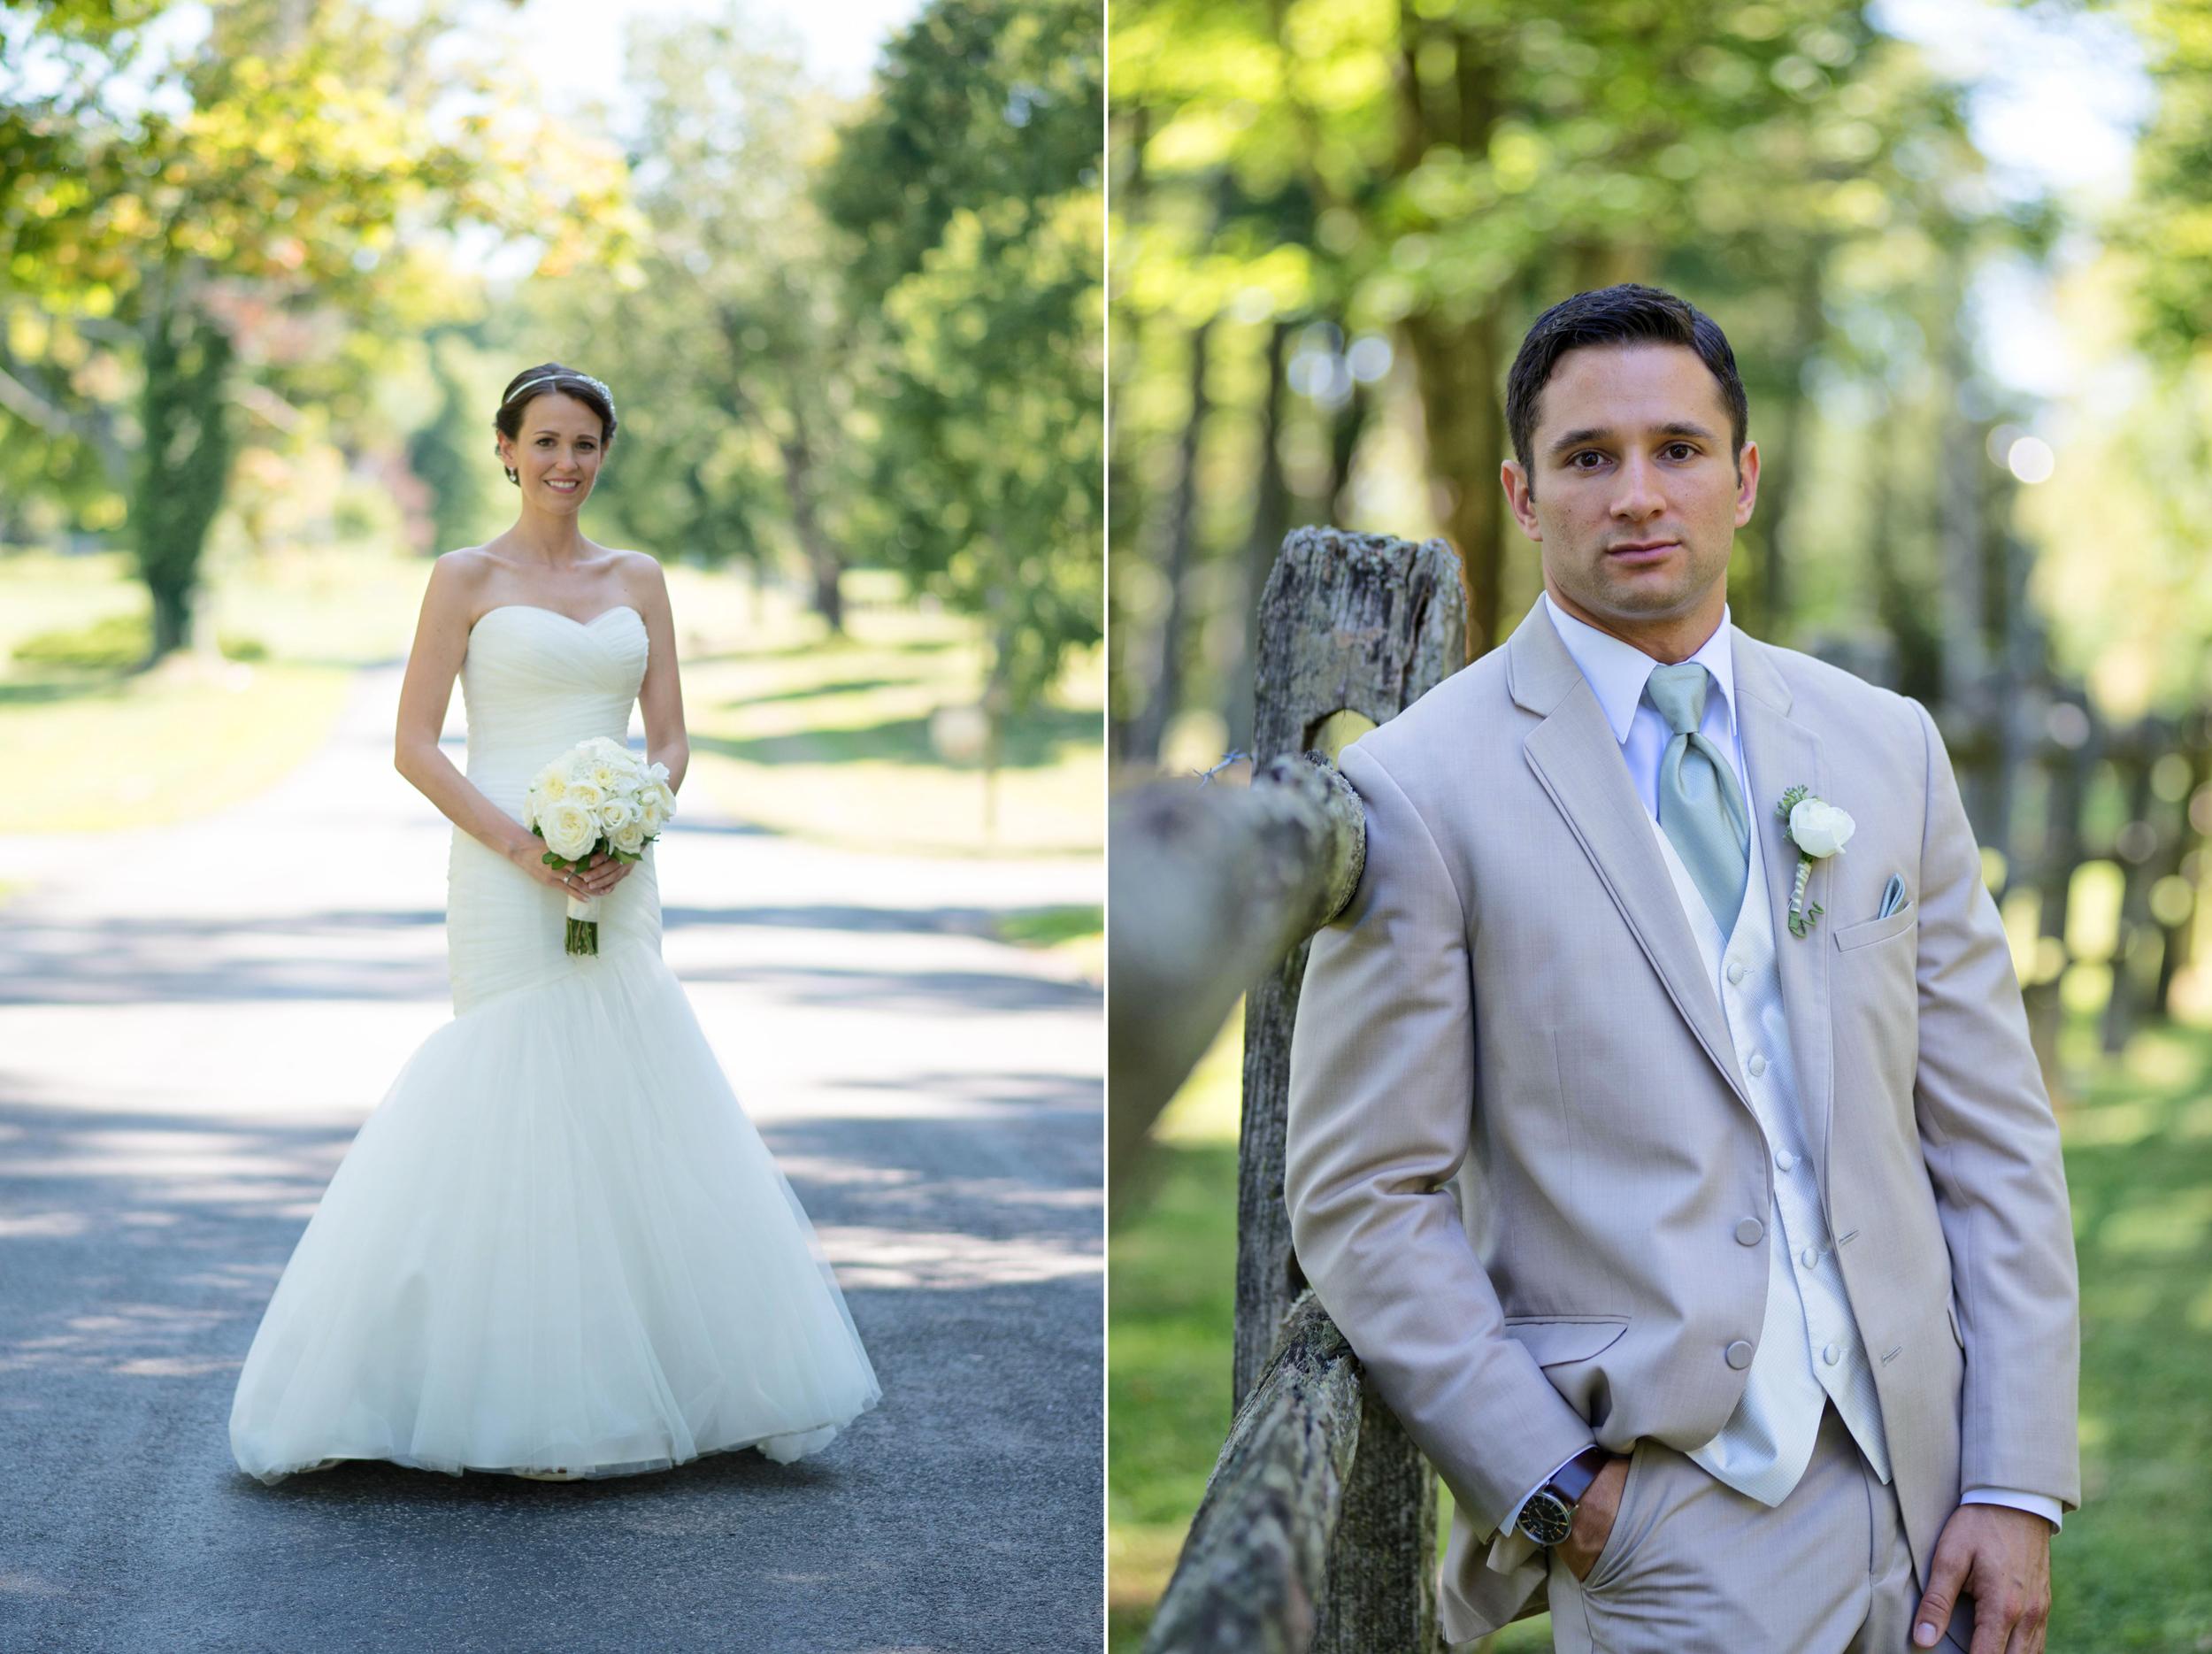 Matt_Swetel_Photography_Erin_and_Jeff_married029.jpg